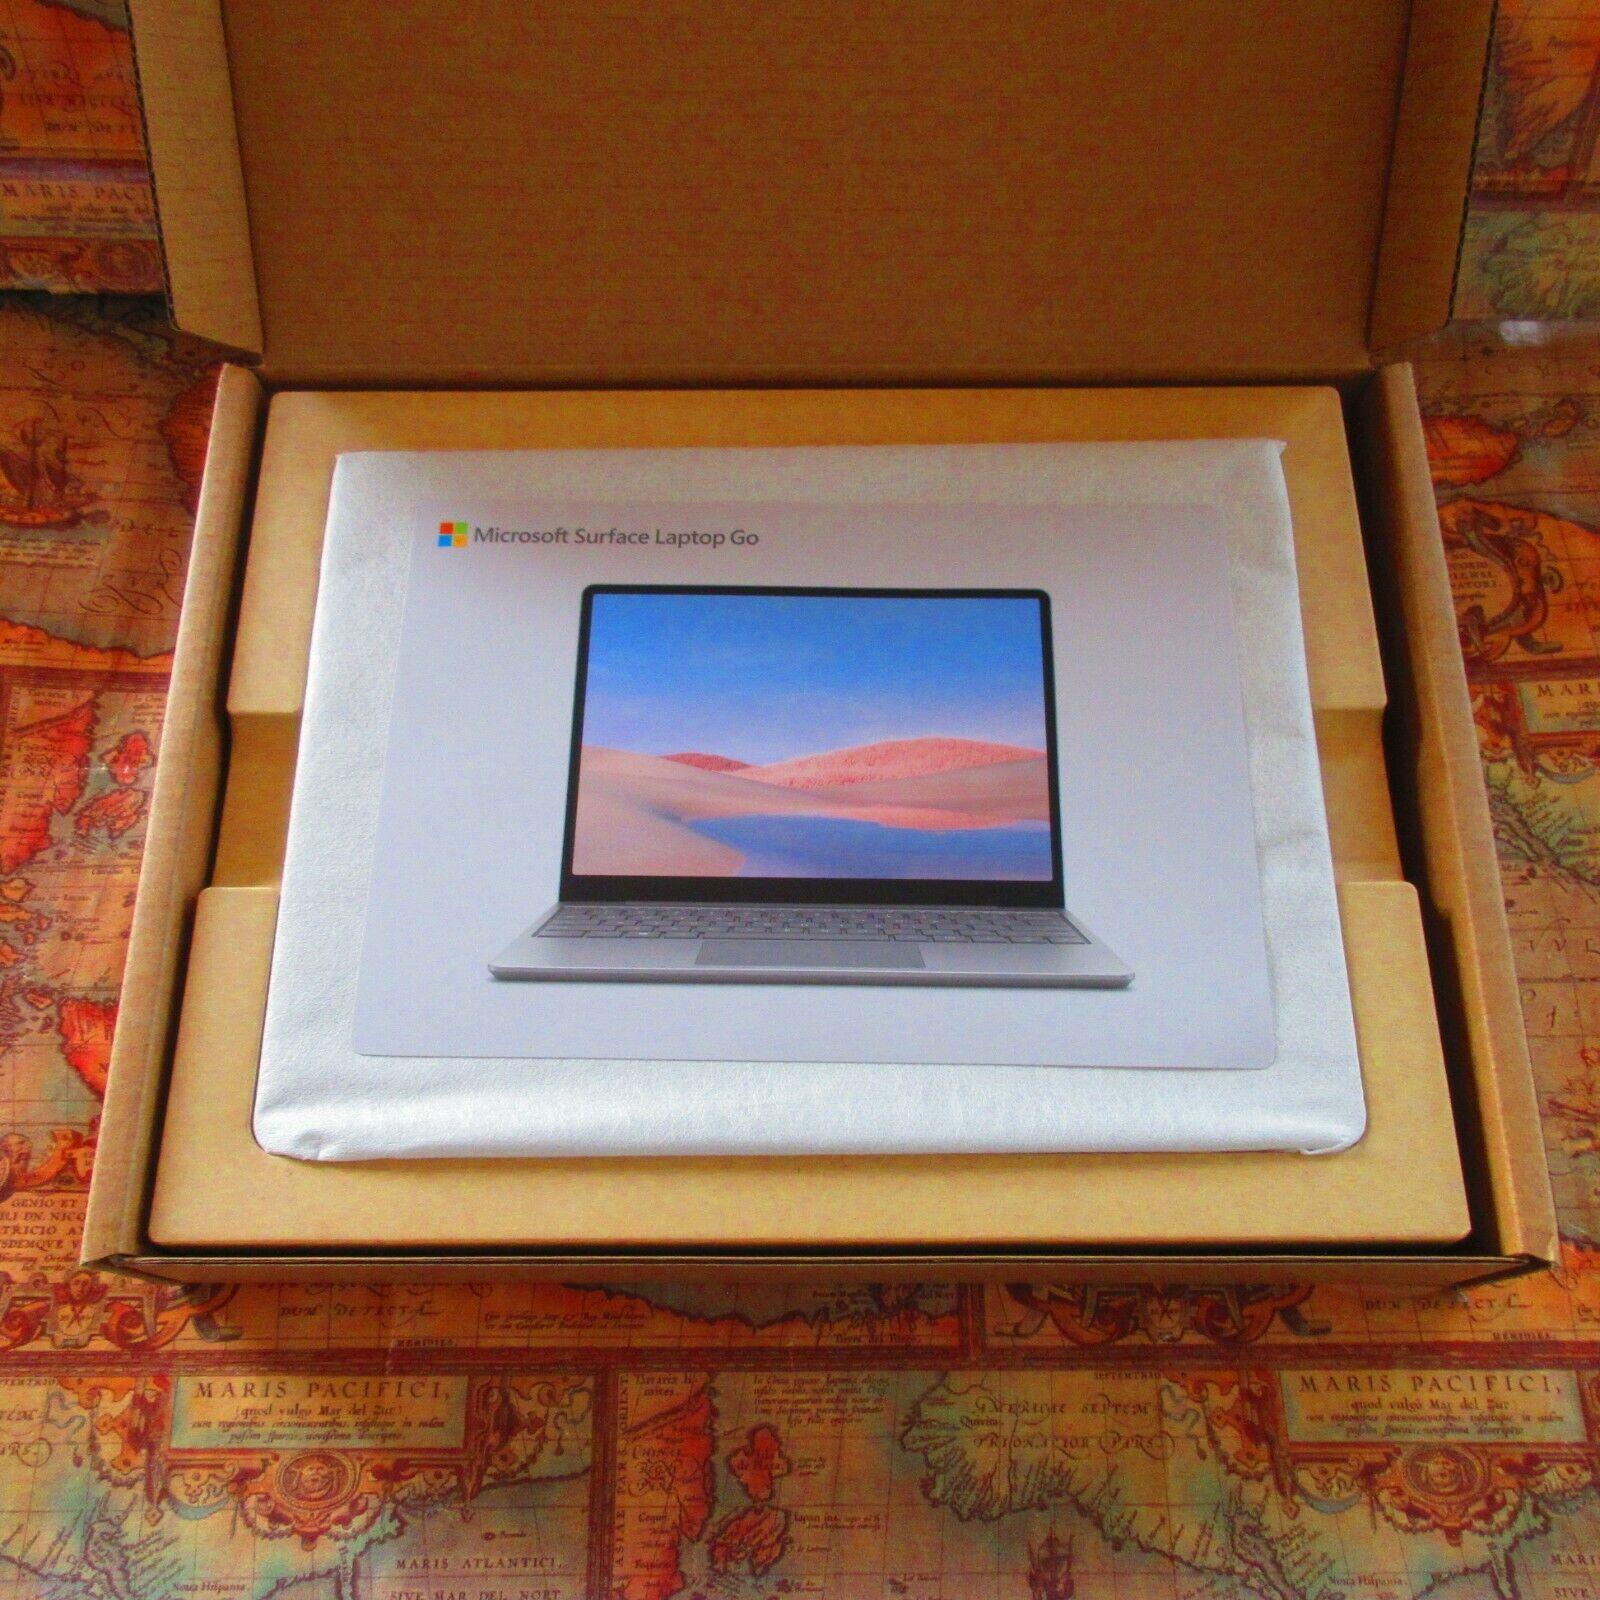 "Laptop Windows - 2020 Microsoft Surface Laptop Go 12.4"" Touchscreen i5, Windows 10 Pro - Platinum"